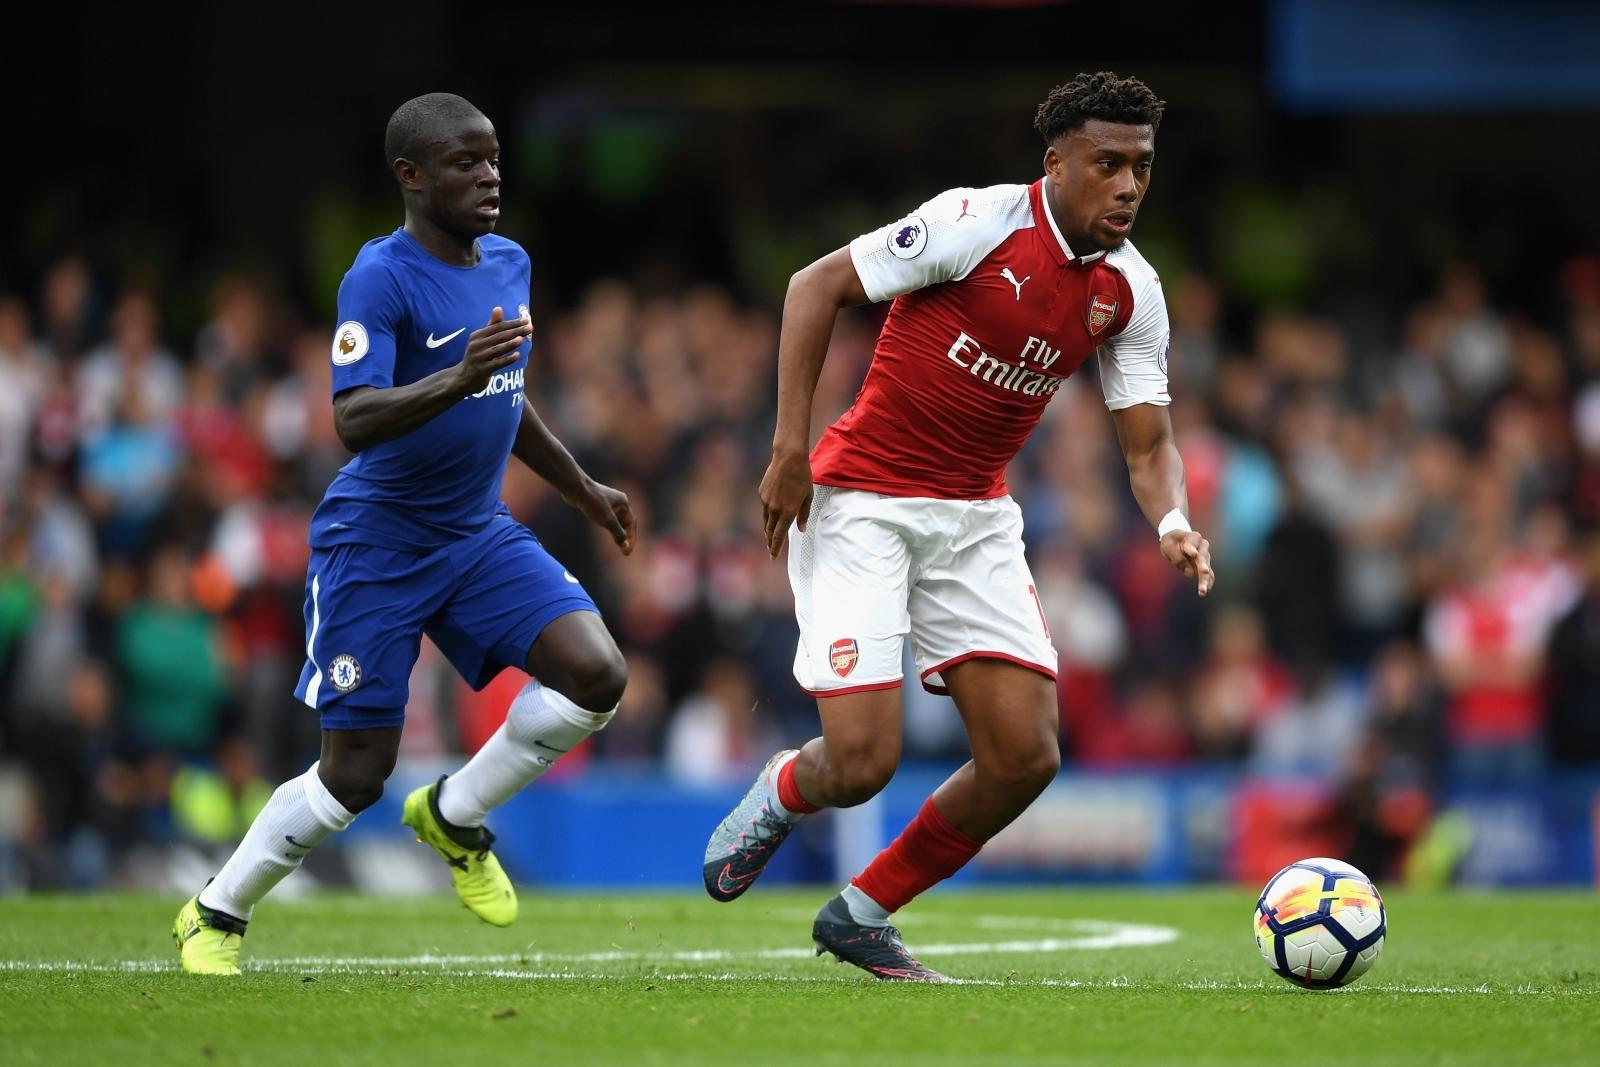 Wenger hints at discontent with Alexis Sanchez